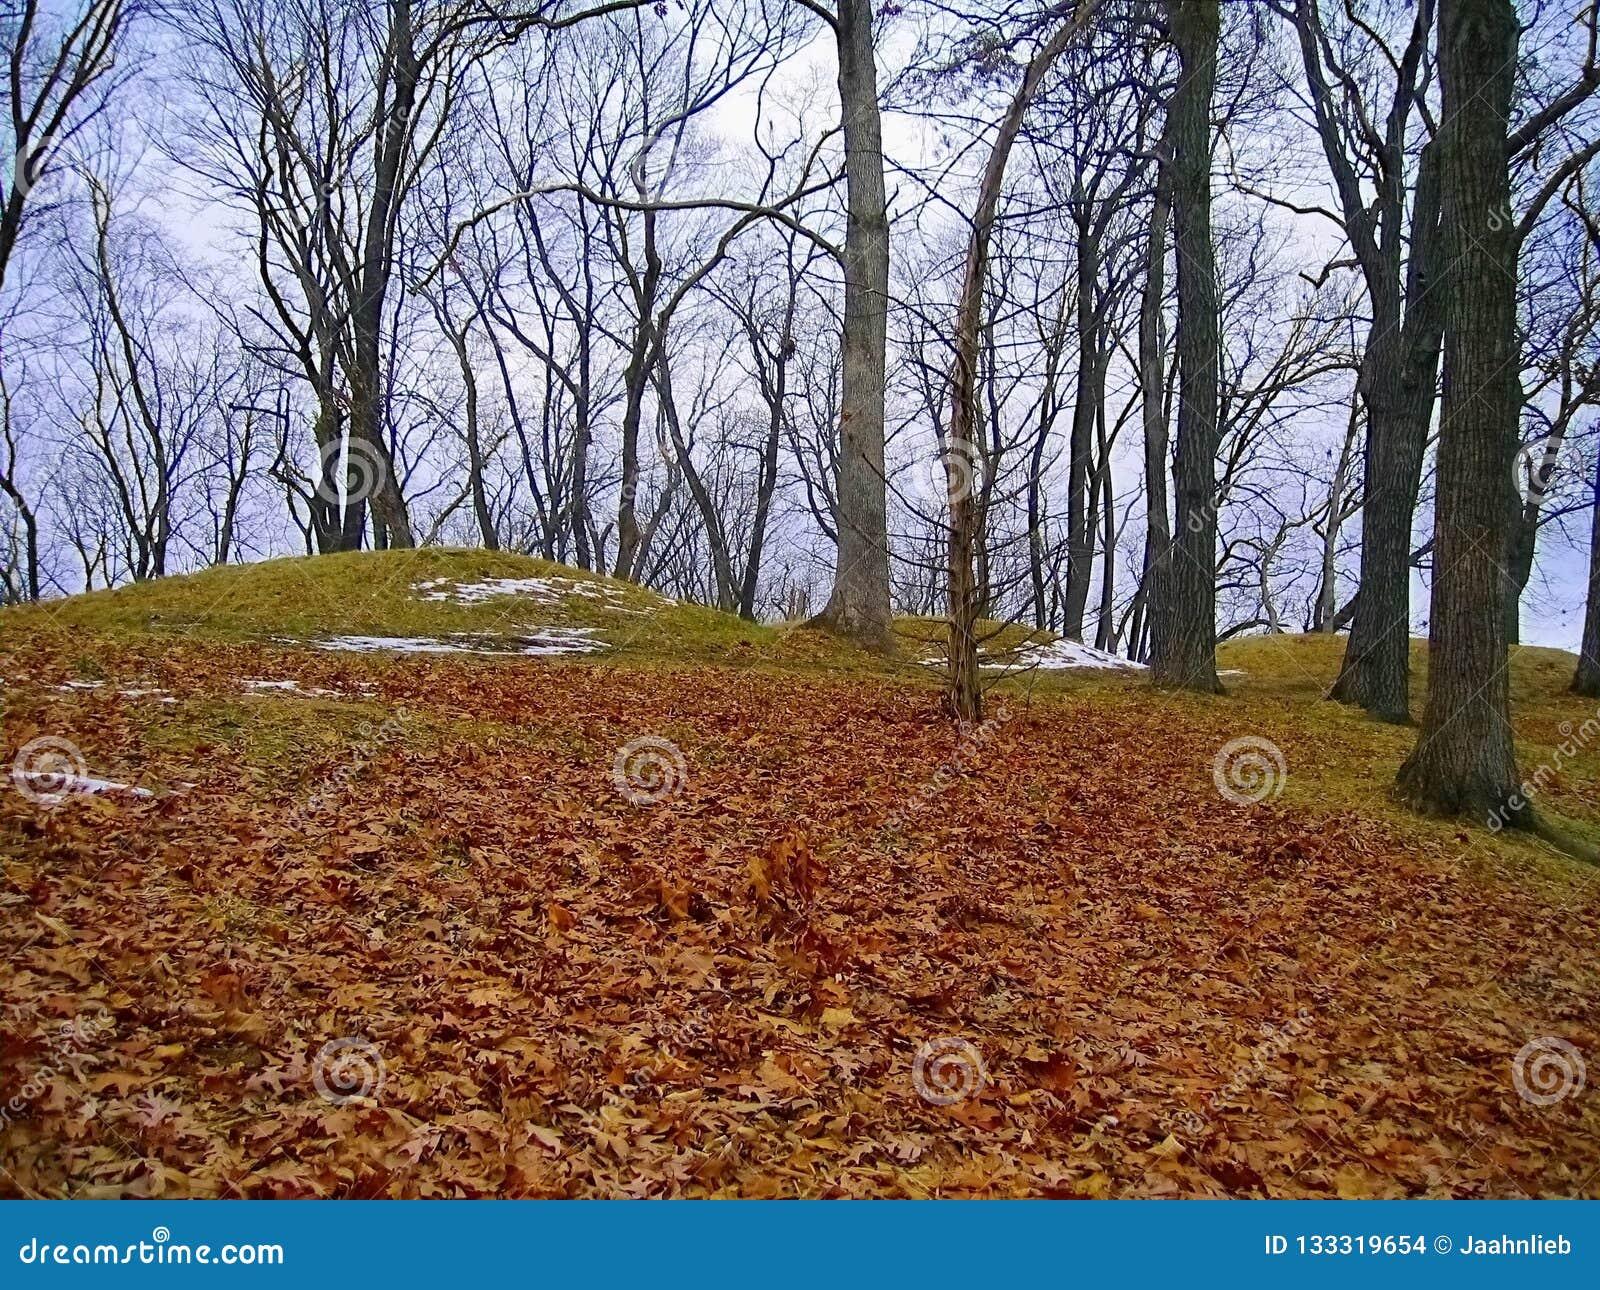 Little Bear Mount Group At Fire Point, Effigy Mounds